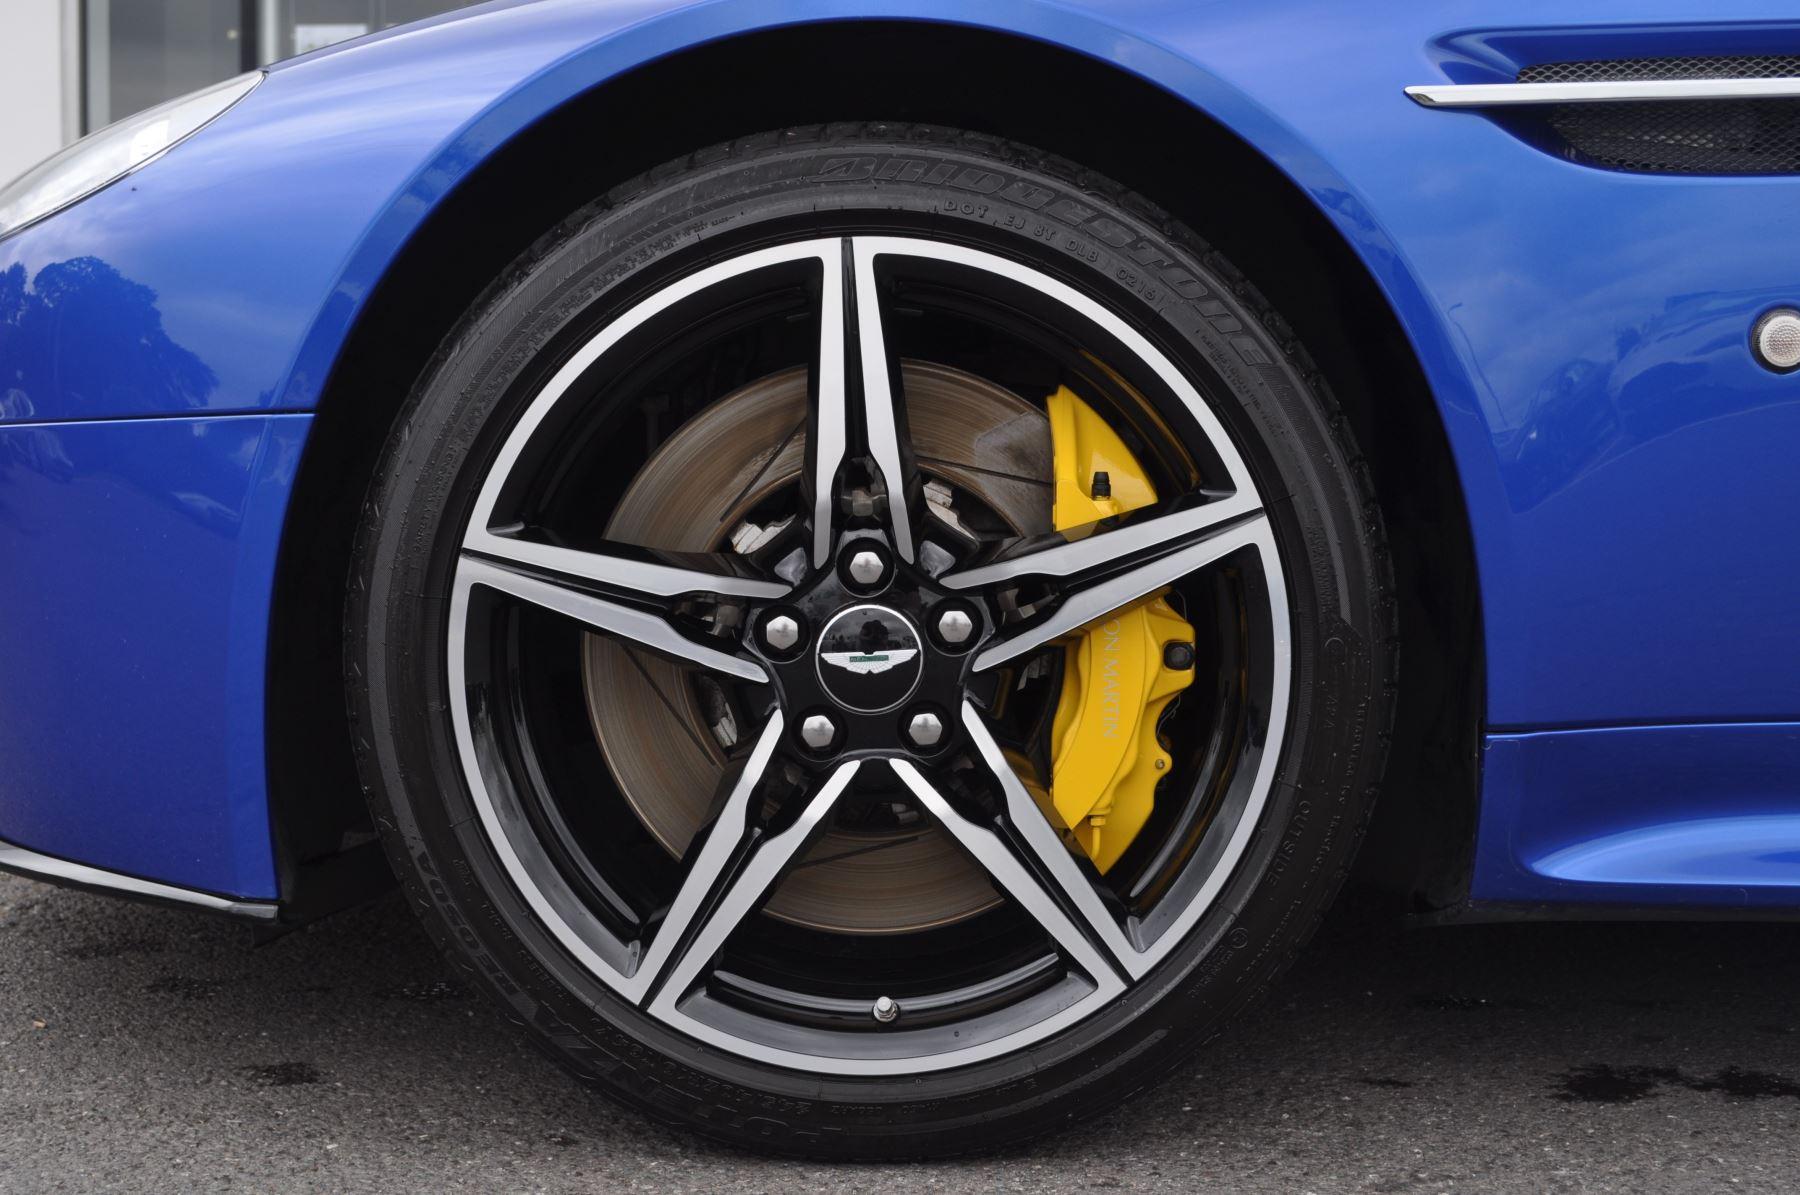 Aston Martin V8 Vantage S Coupe S 2dr Sportshift image 44